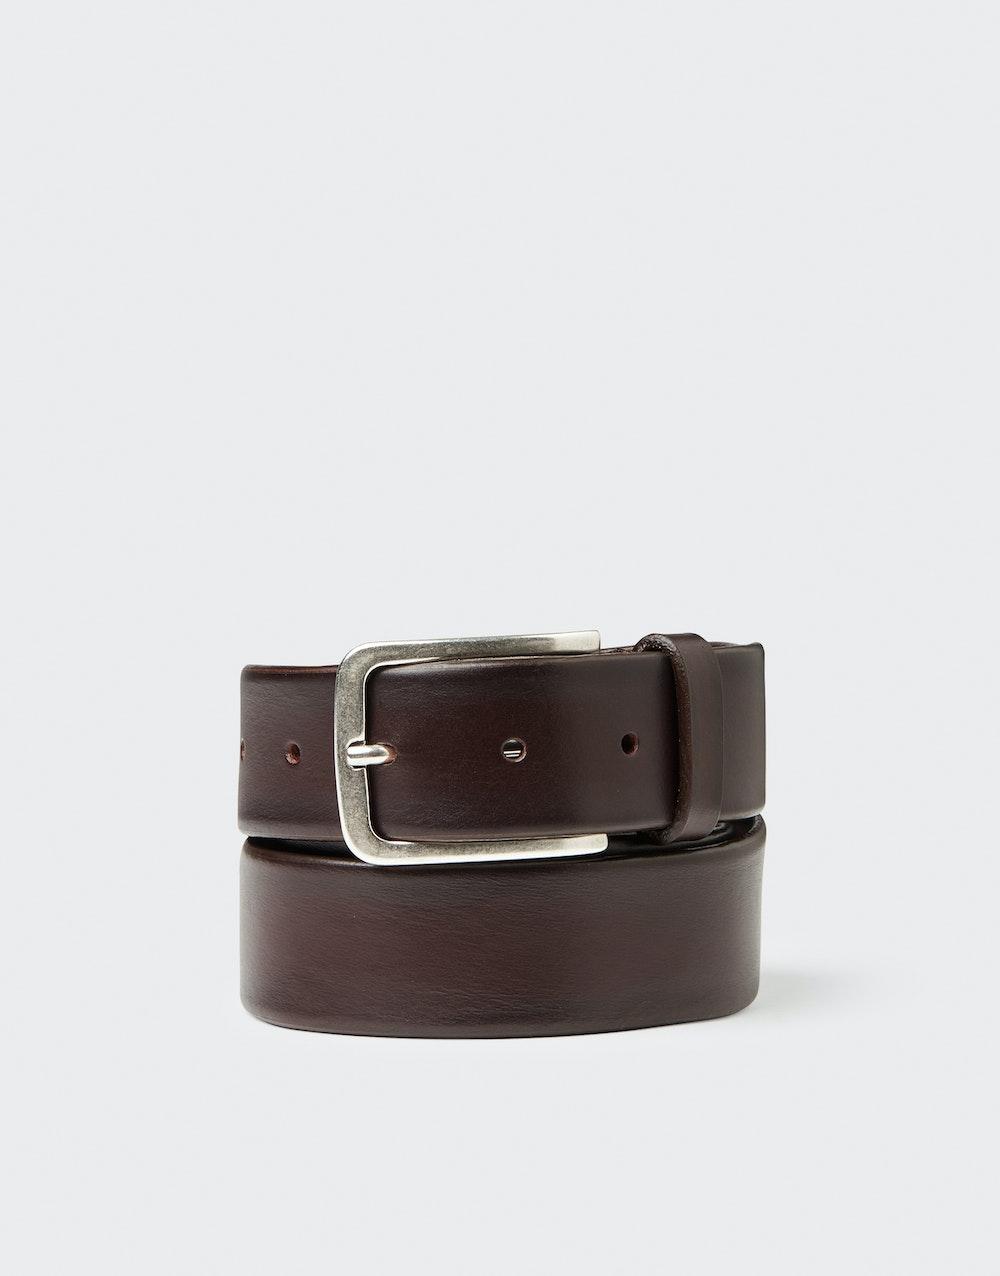 Jacques belt Dark brown Saddler